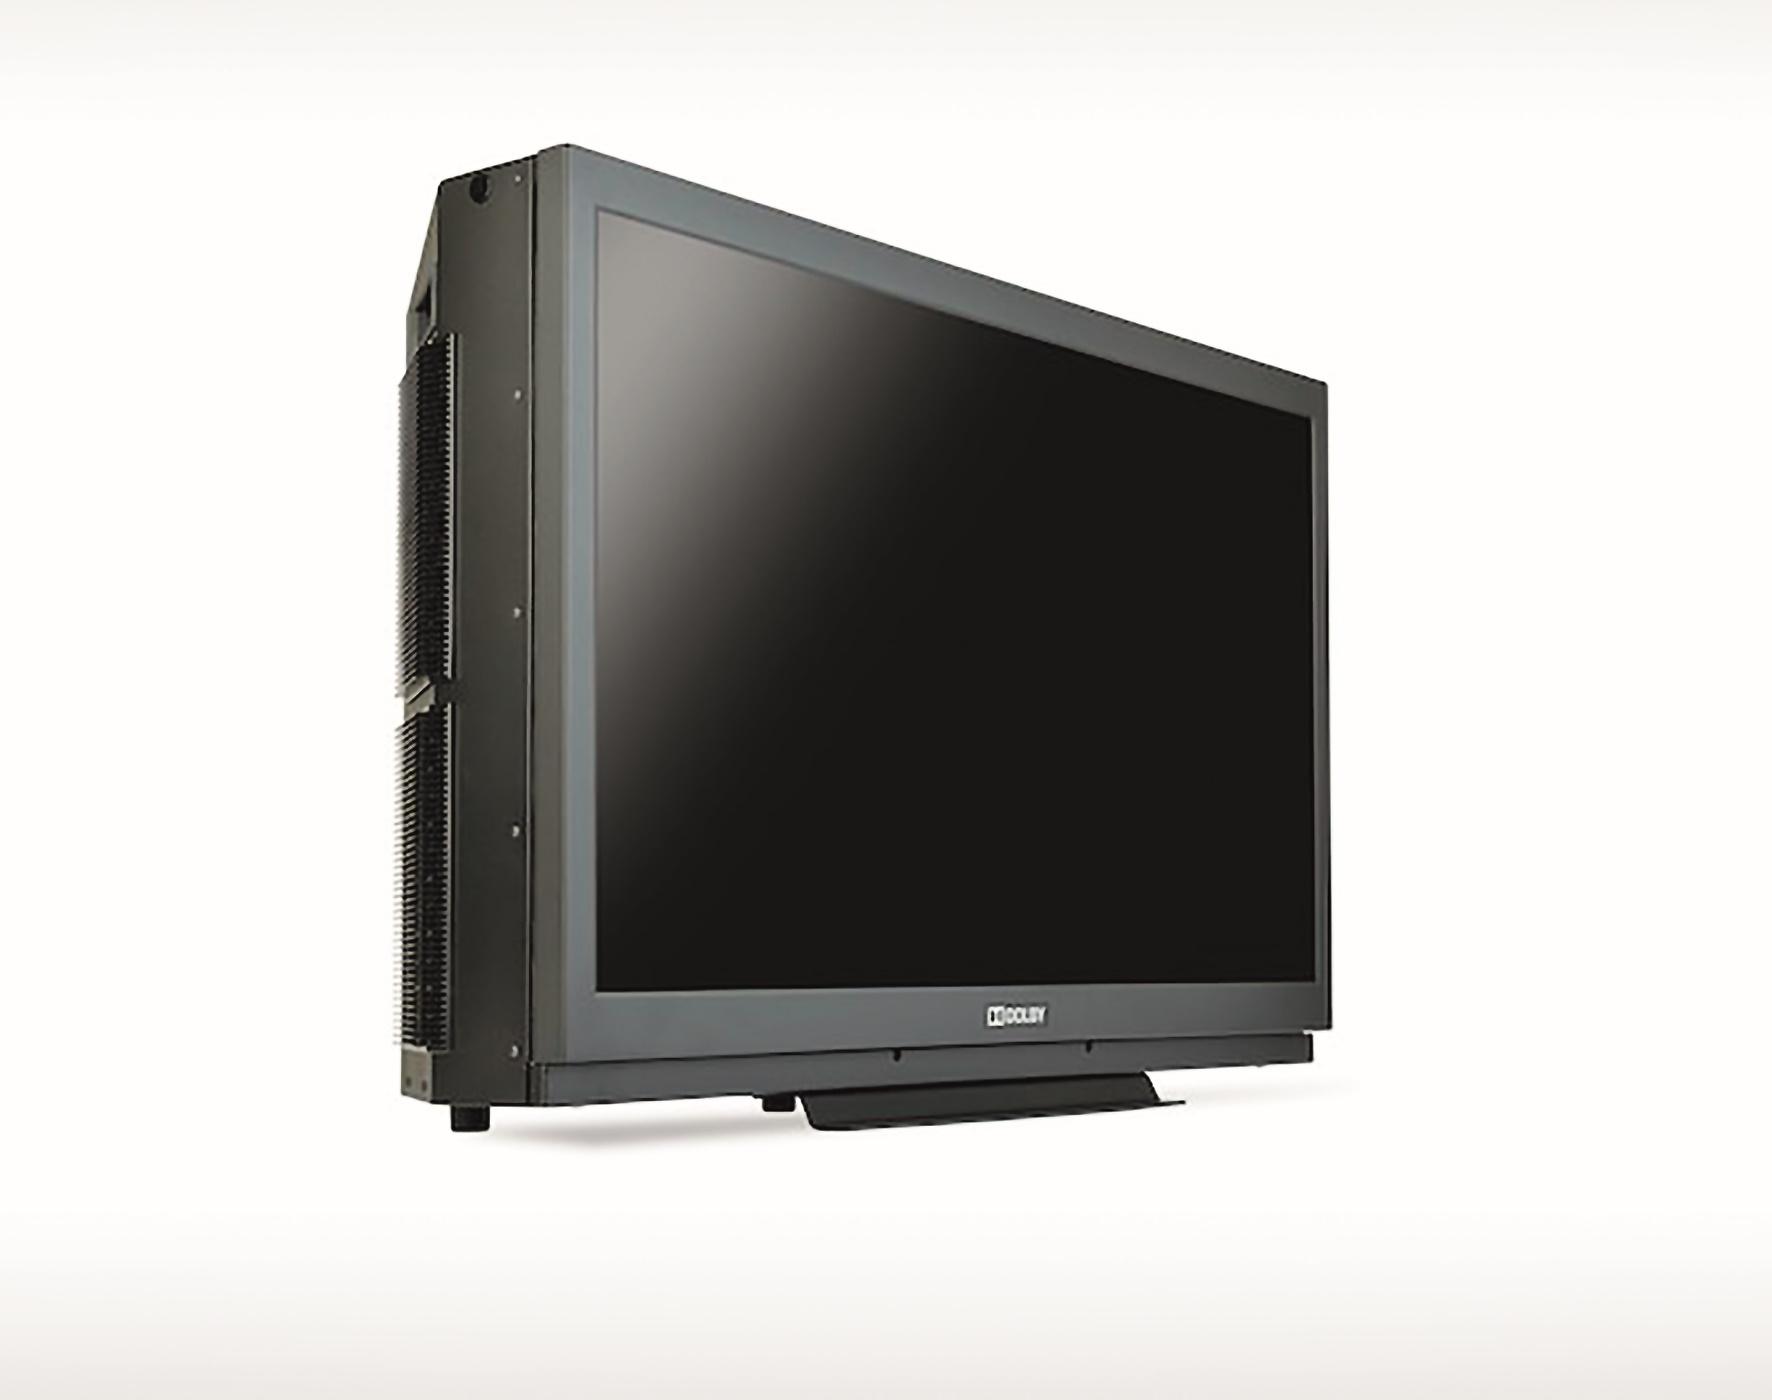 Dolby PRM 4200